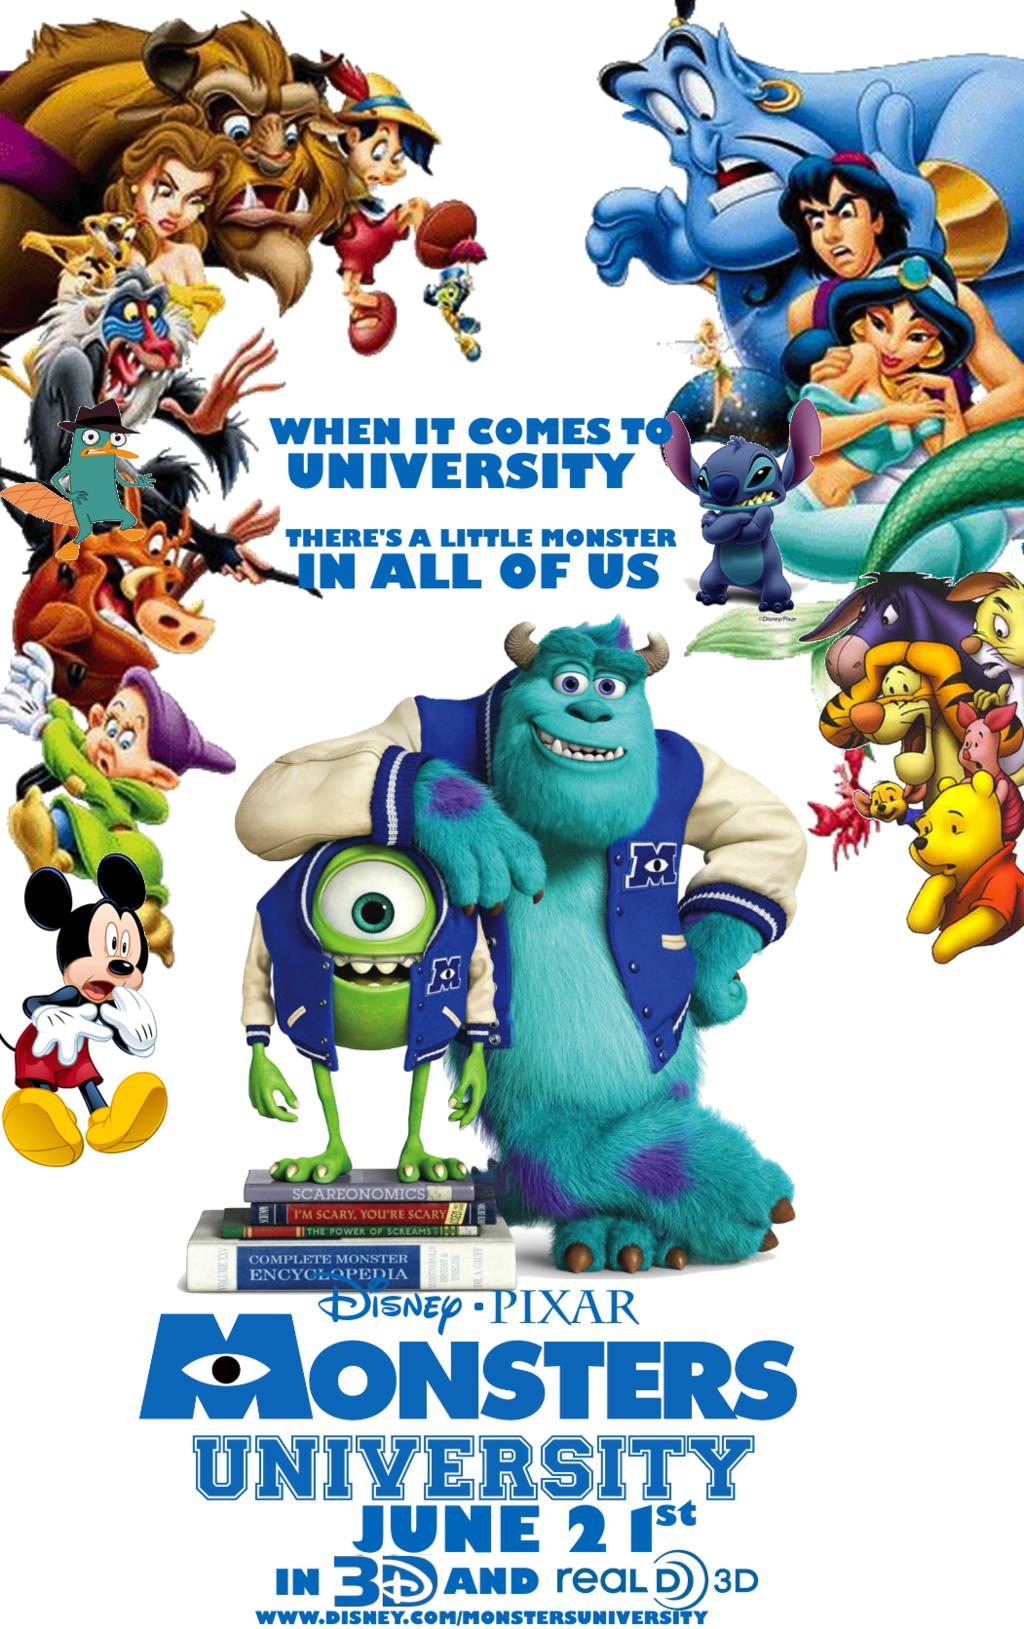 Disney Pixar Monsters University Disney Pixars Monsters University Poster My Own By Edogg8181804 On Monster University Pixar Disney Pixar